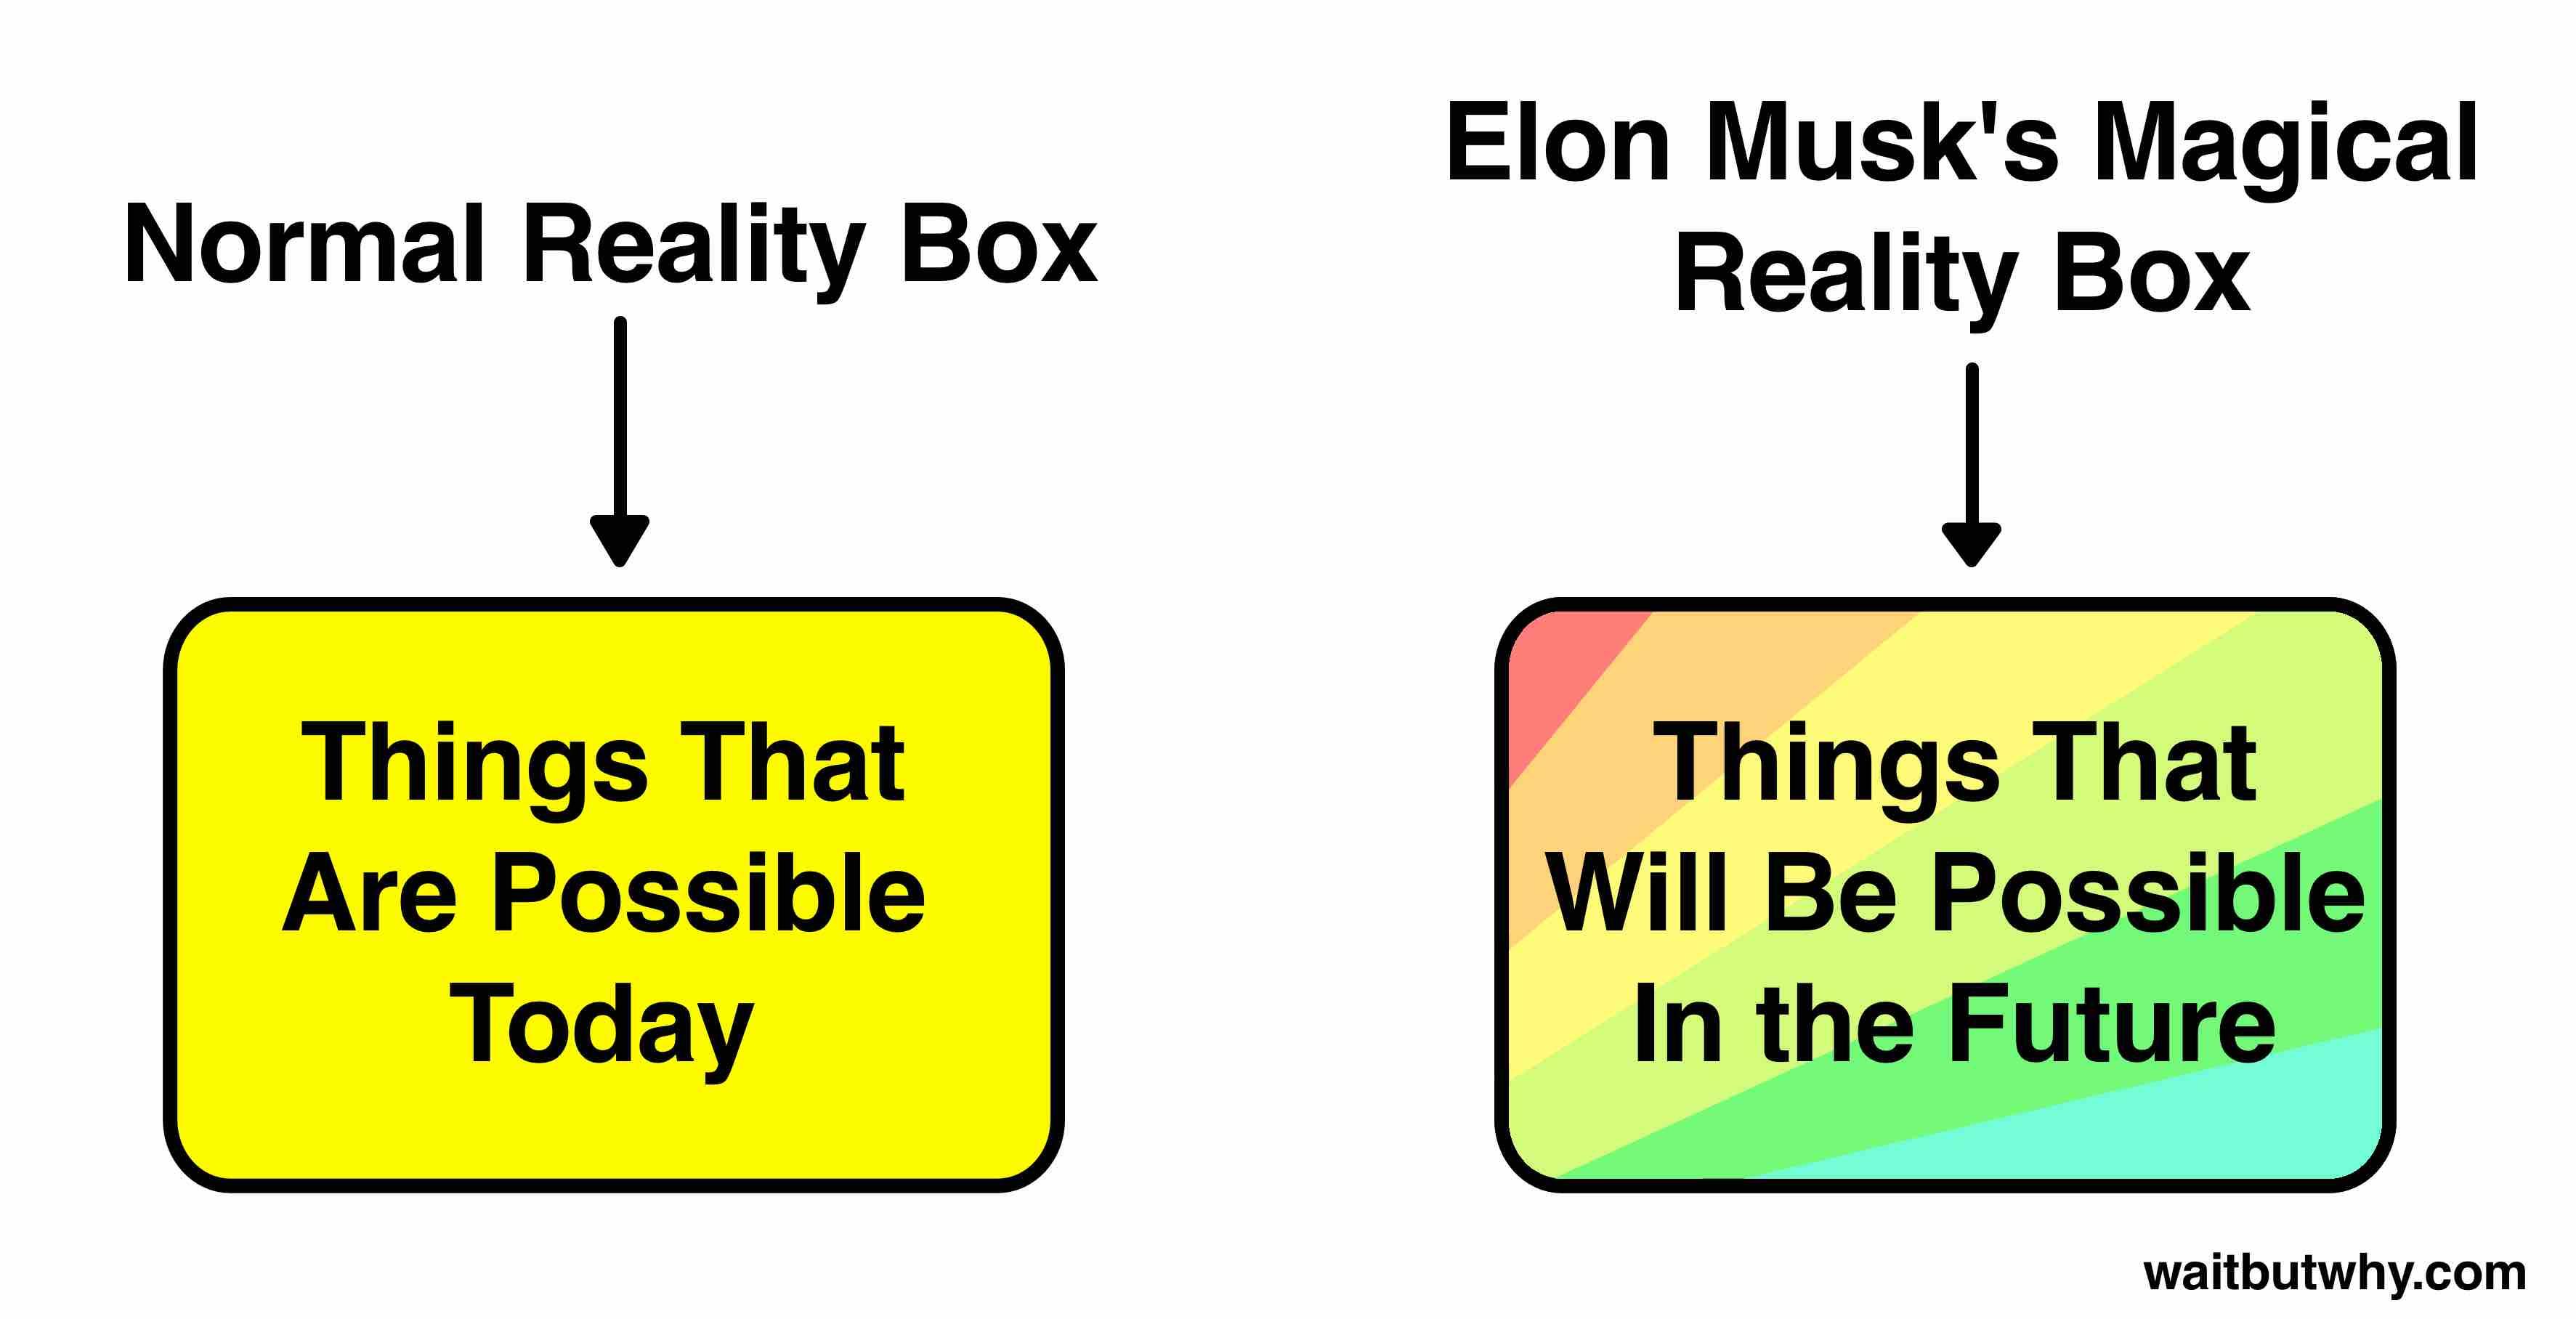 Musk Visionary 1